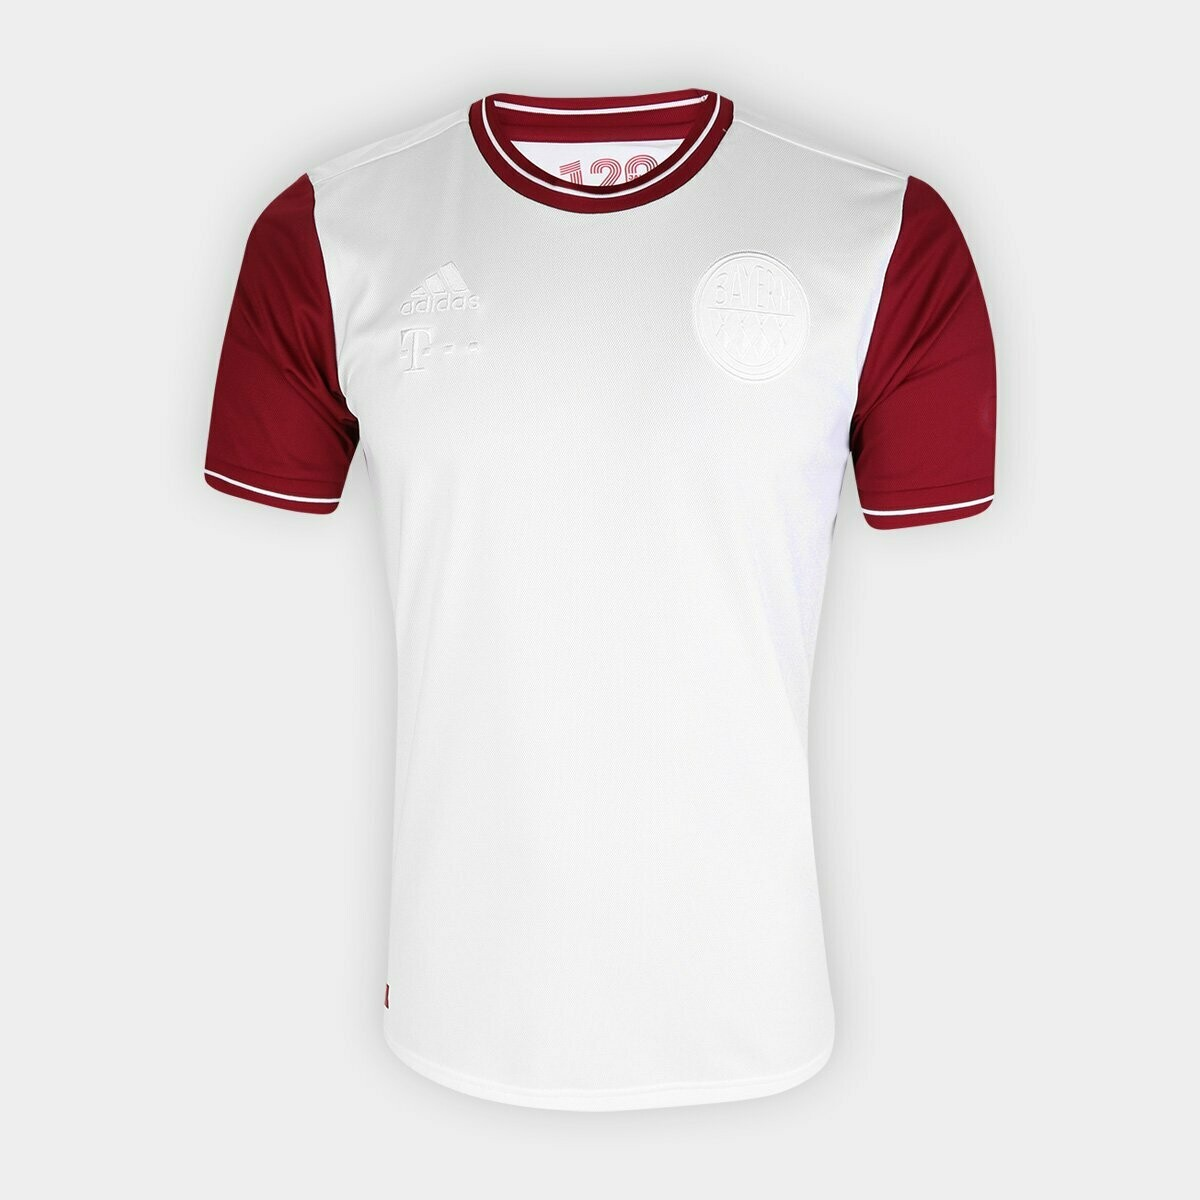 Camisa Bayern de Munique 120 anos Torcedor Adidas Masculina - Branco